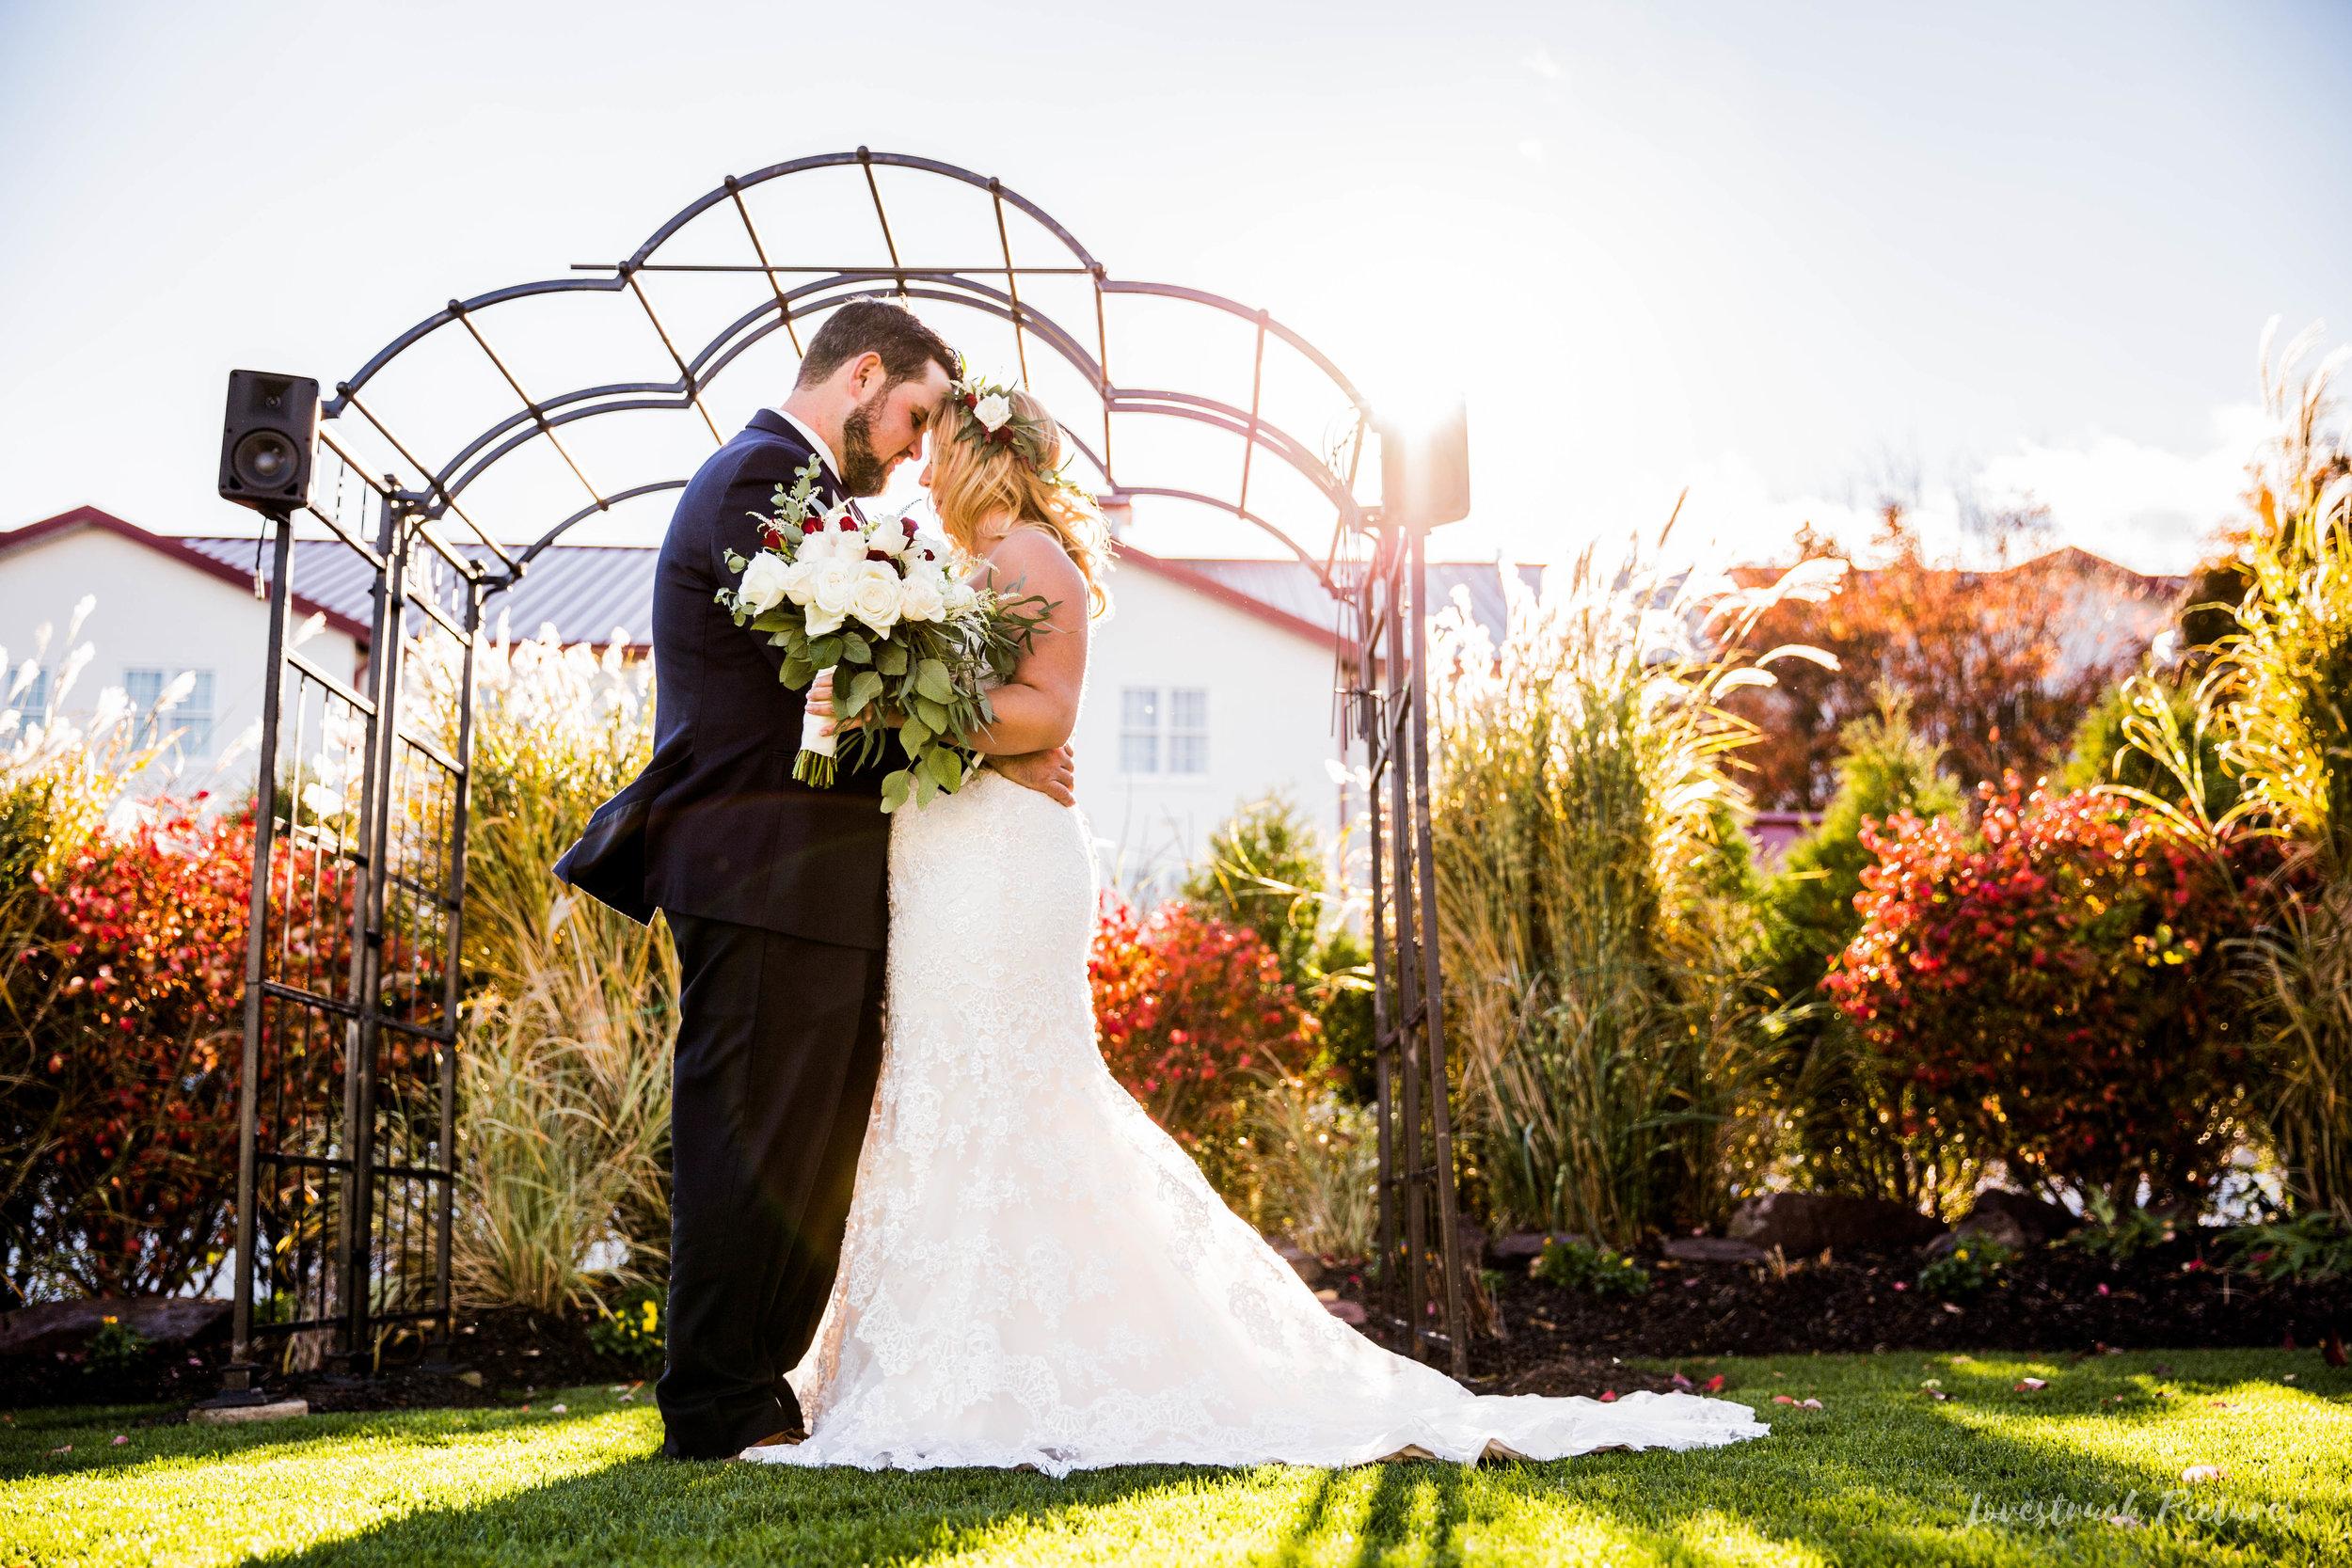 NORMANDY_FARMS_WEDDING_BLUEBELL_PA--27.jpg